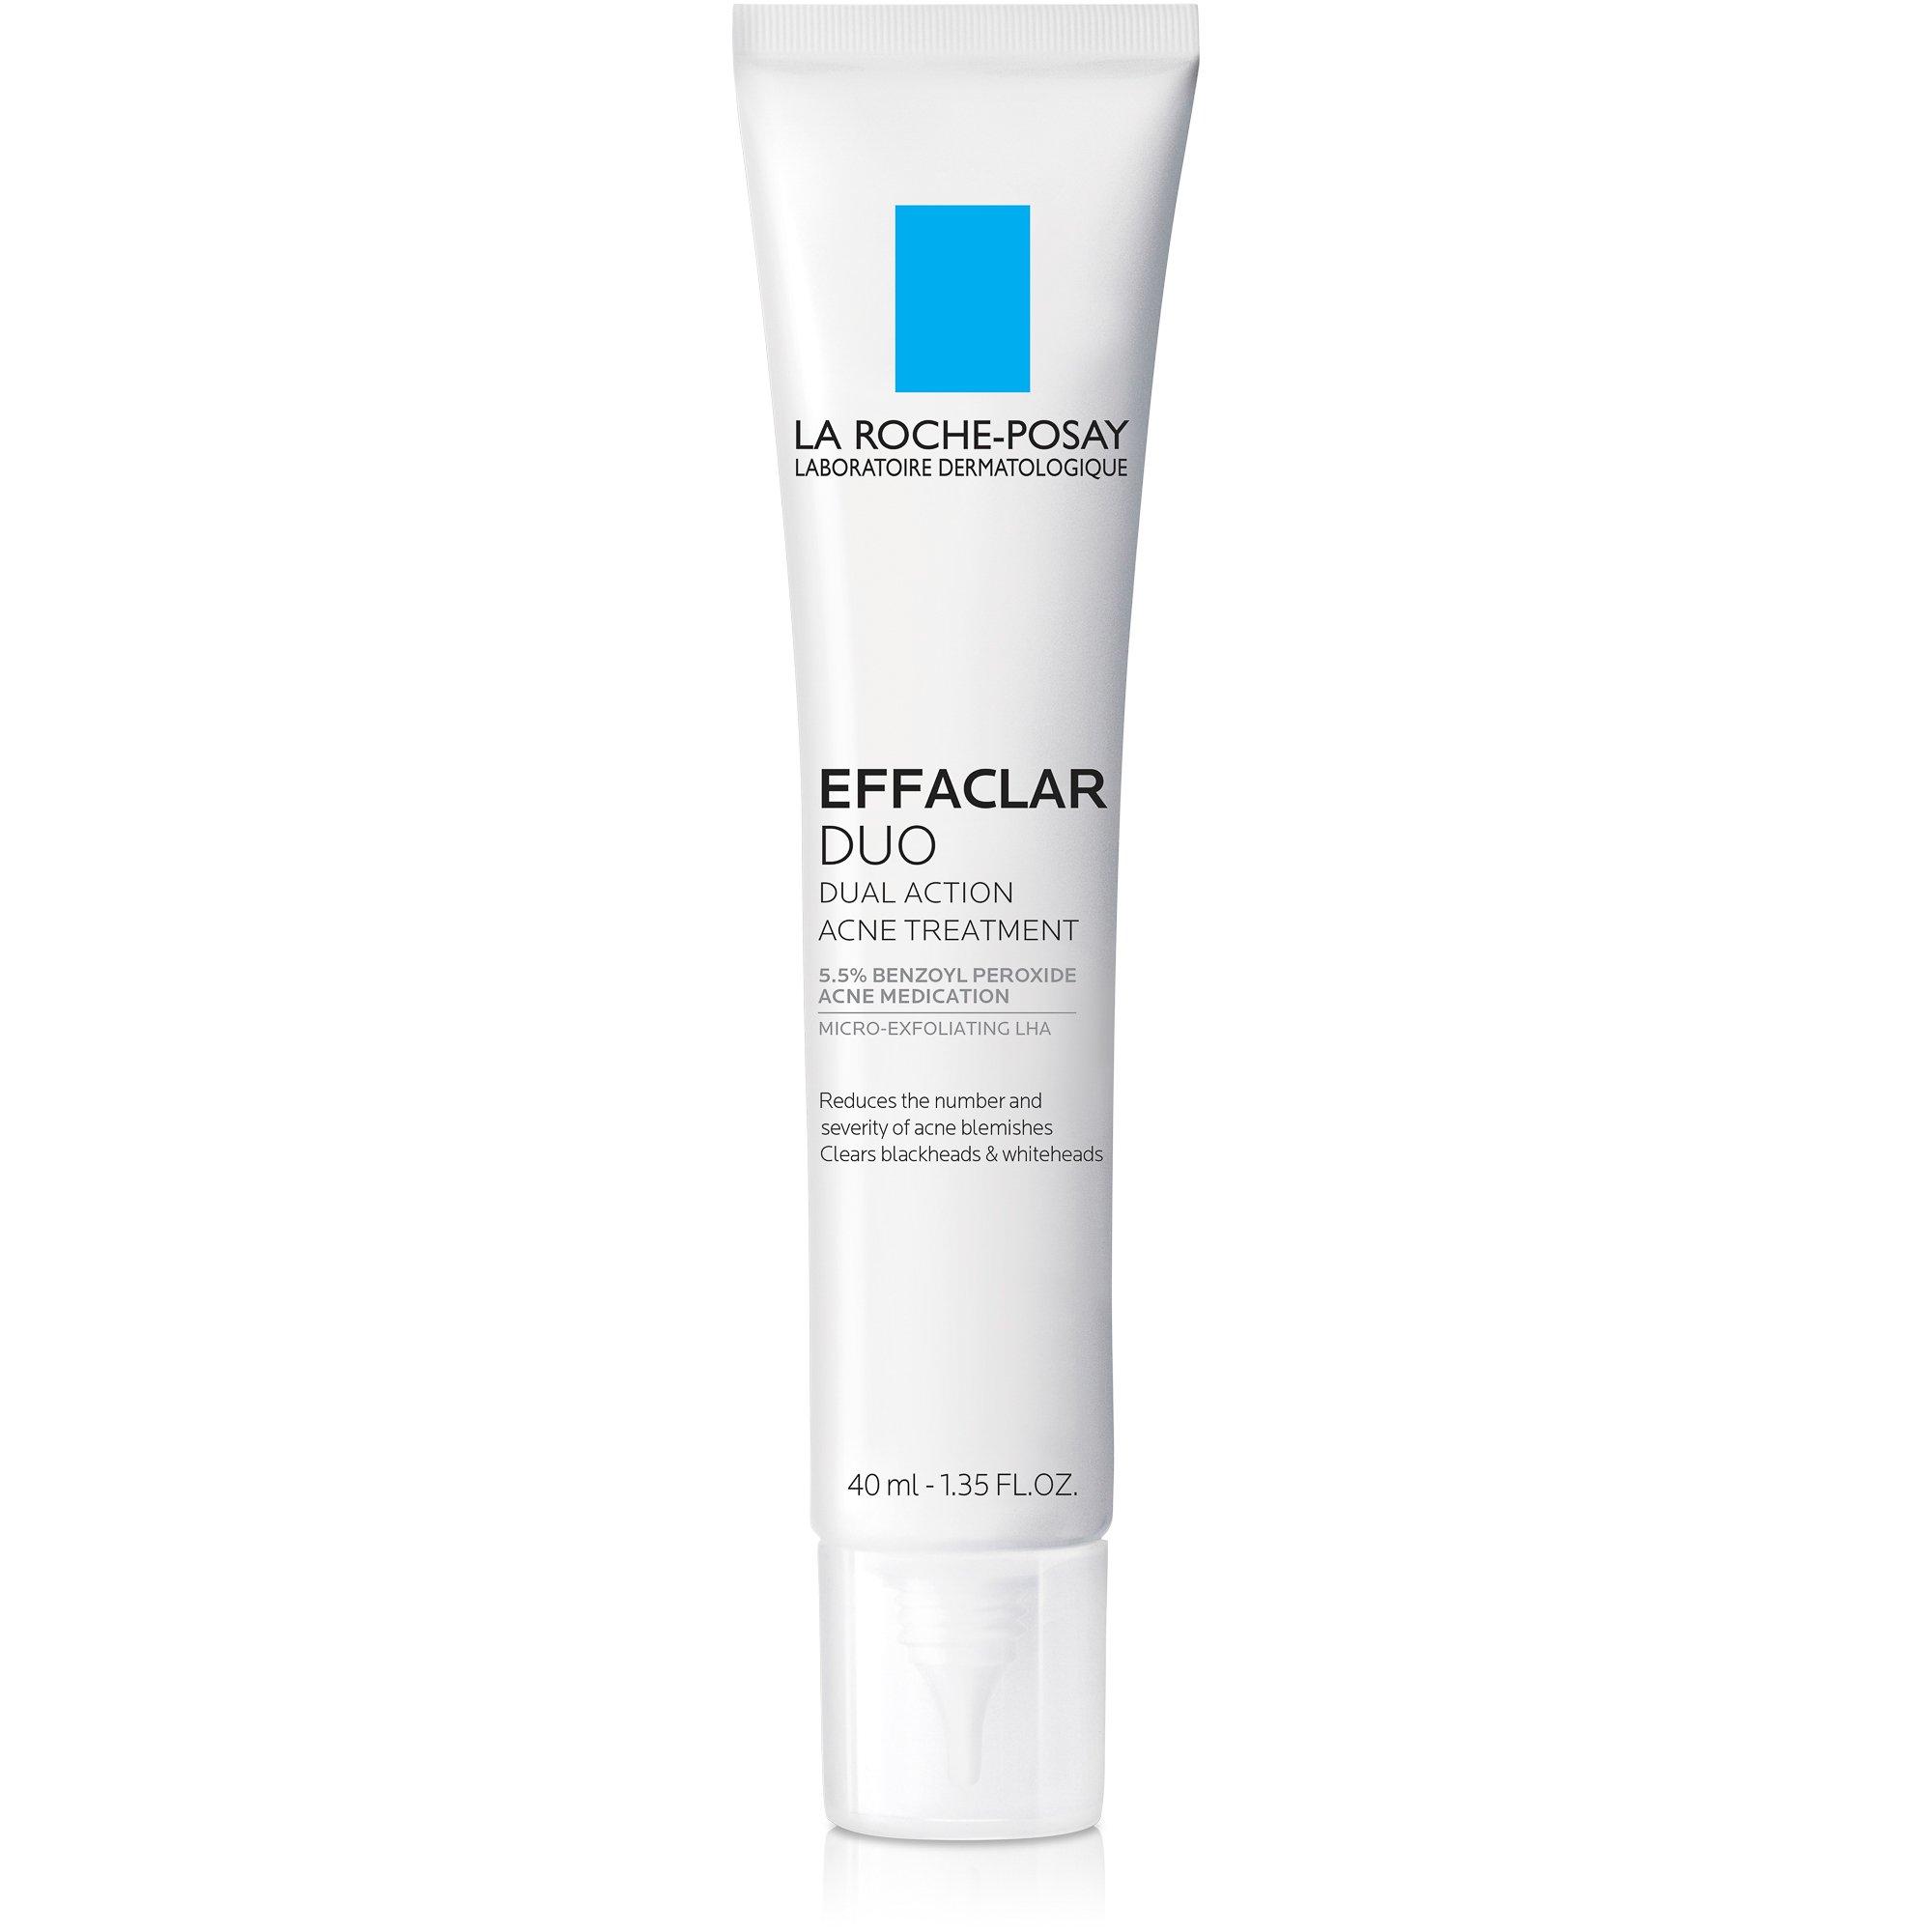 La Roche-Posay Effaclar Duo Acne Treatment with Benzoyl Peroxide, 1.35 Fl Oz.